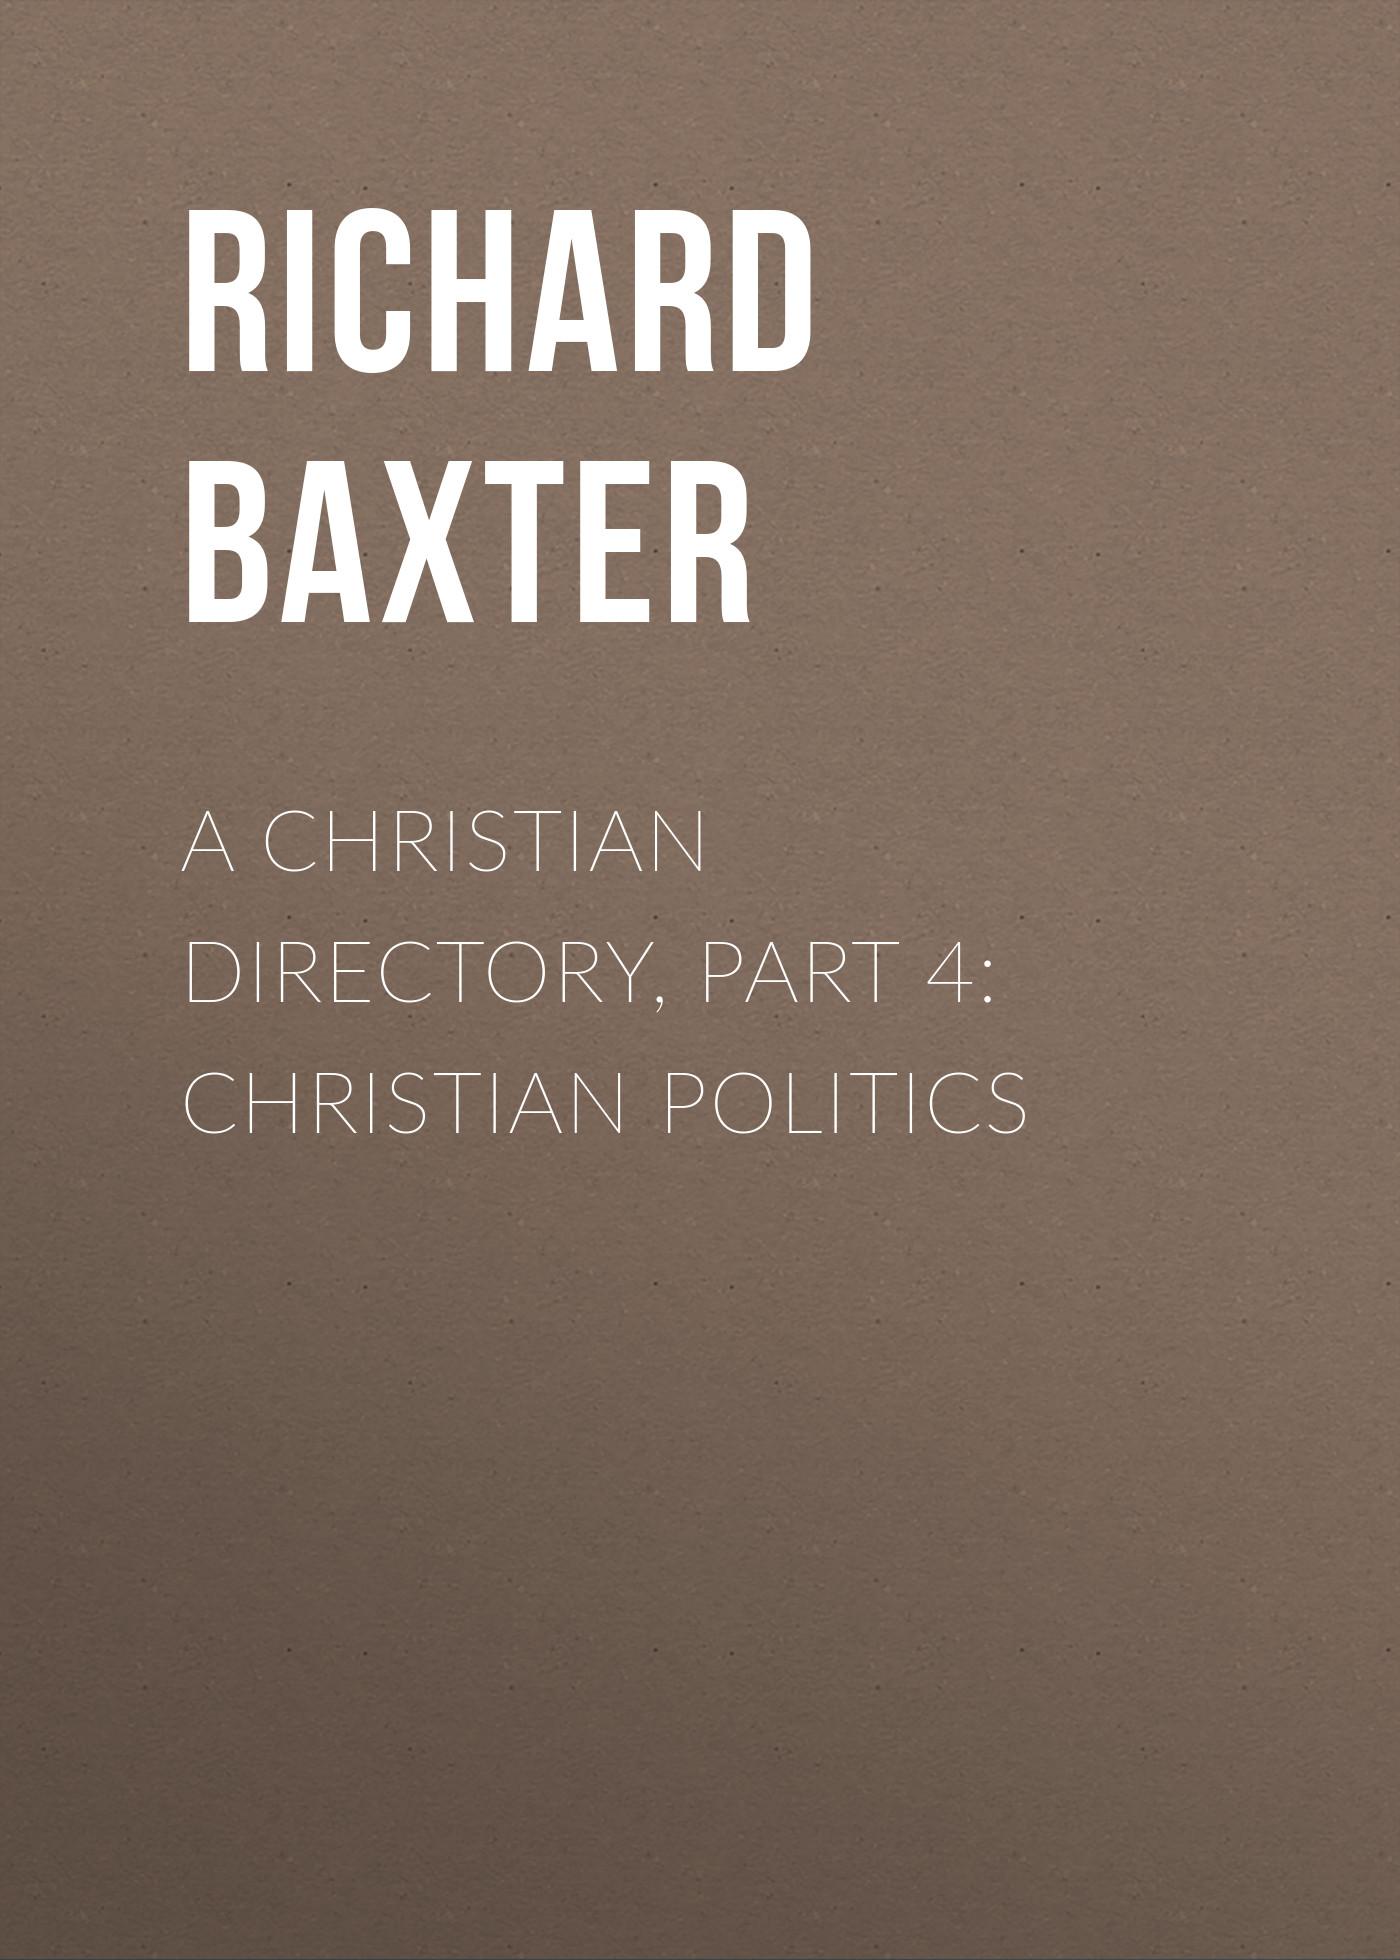 Baxter Richard A Christian Directory, Part 4: Christian Politics алексей номейн html шпаргалка isbn 9785448517723